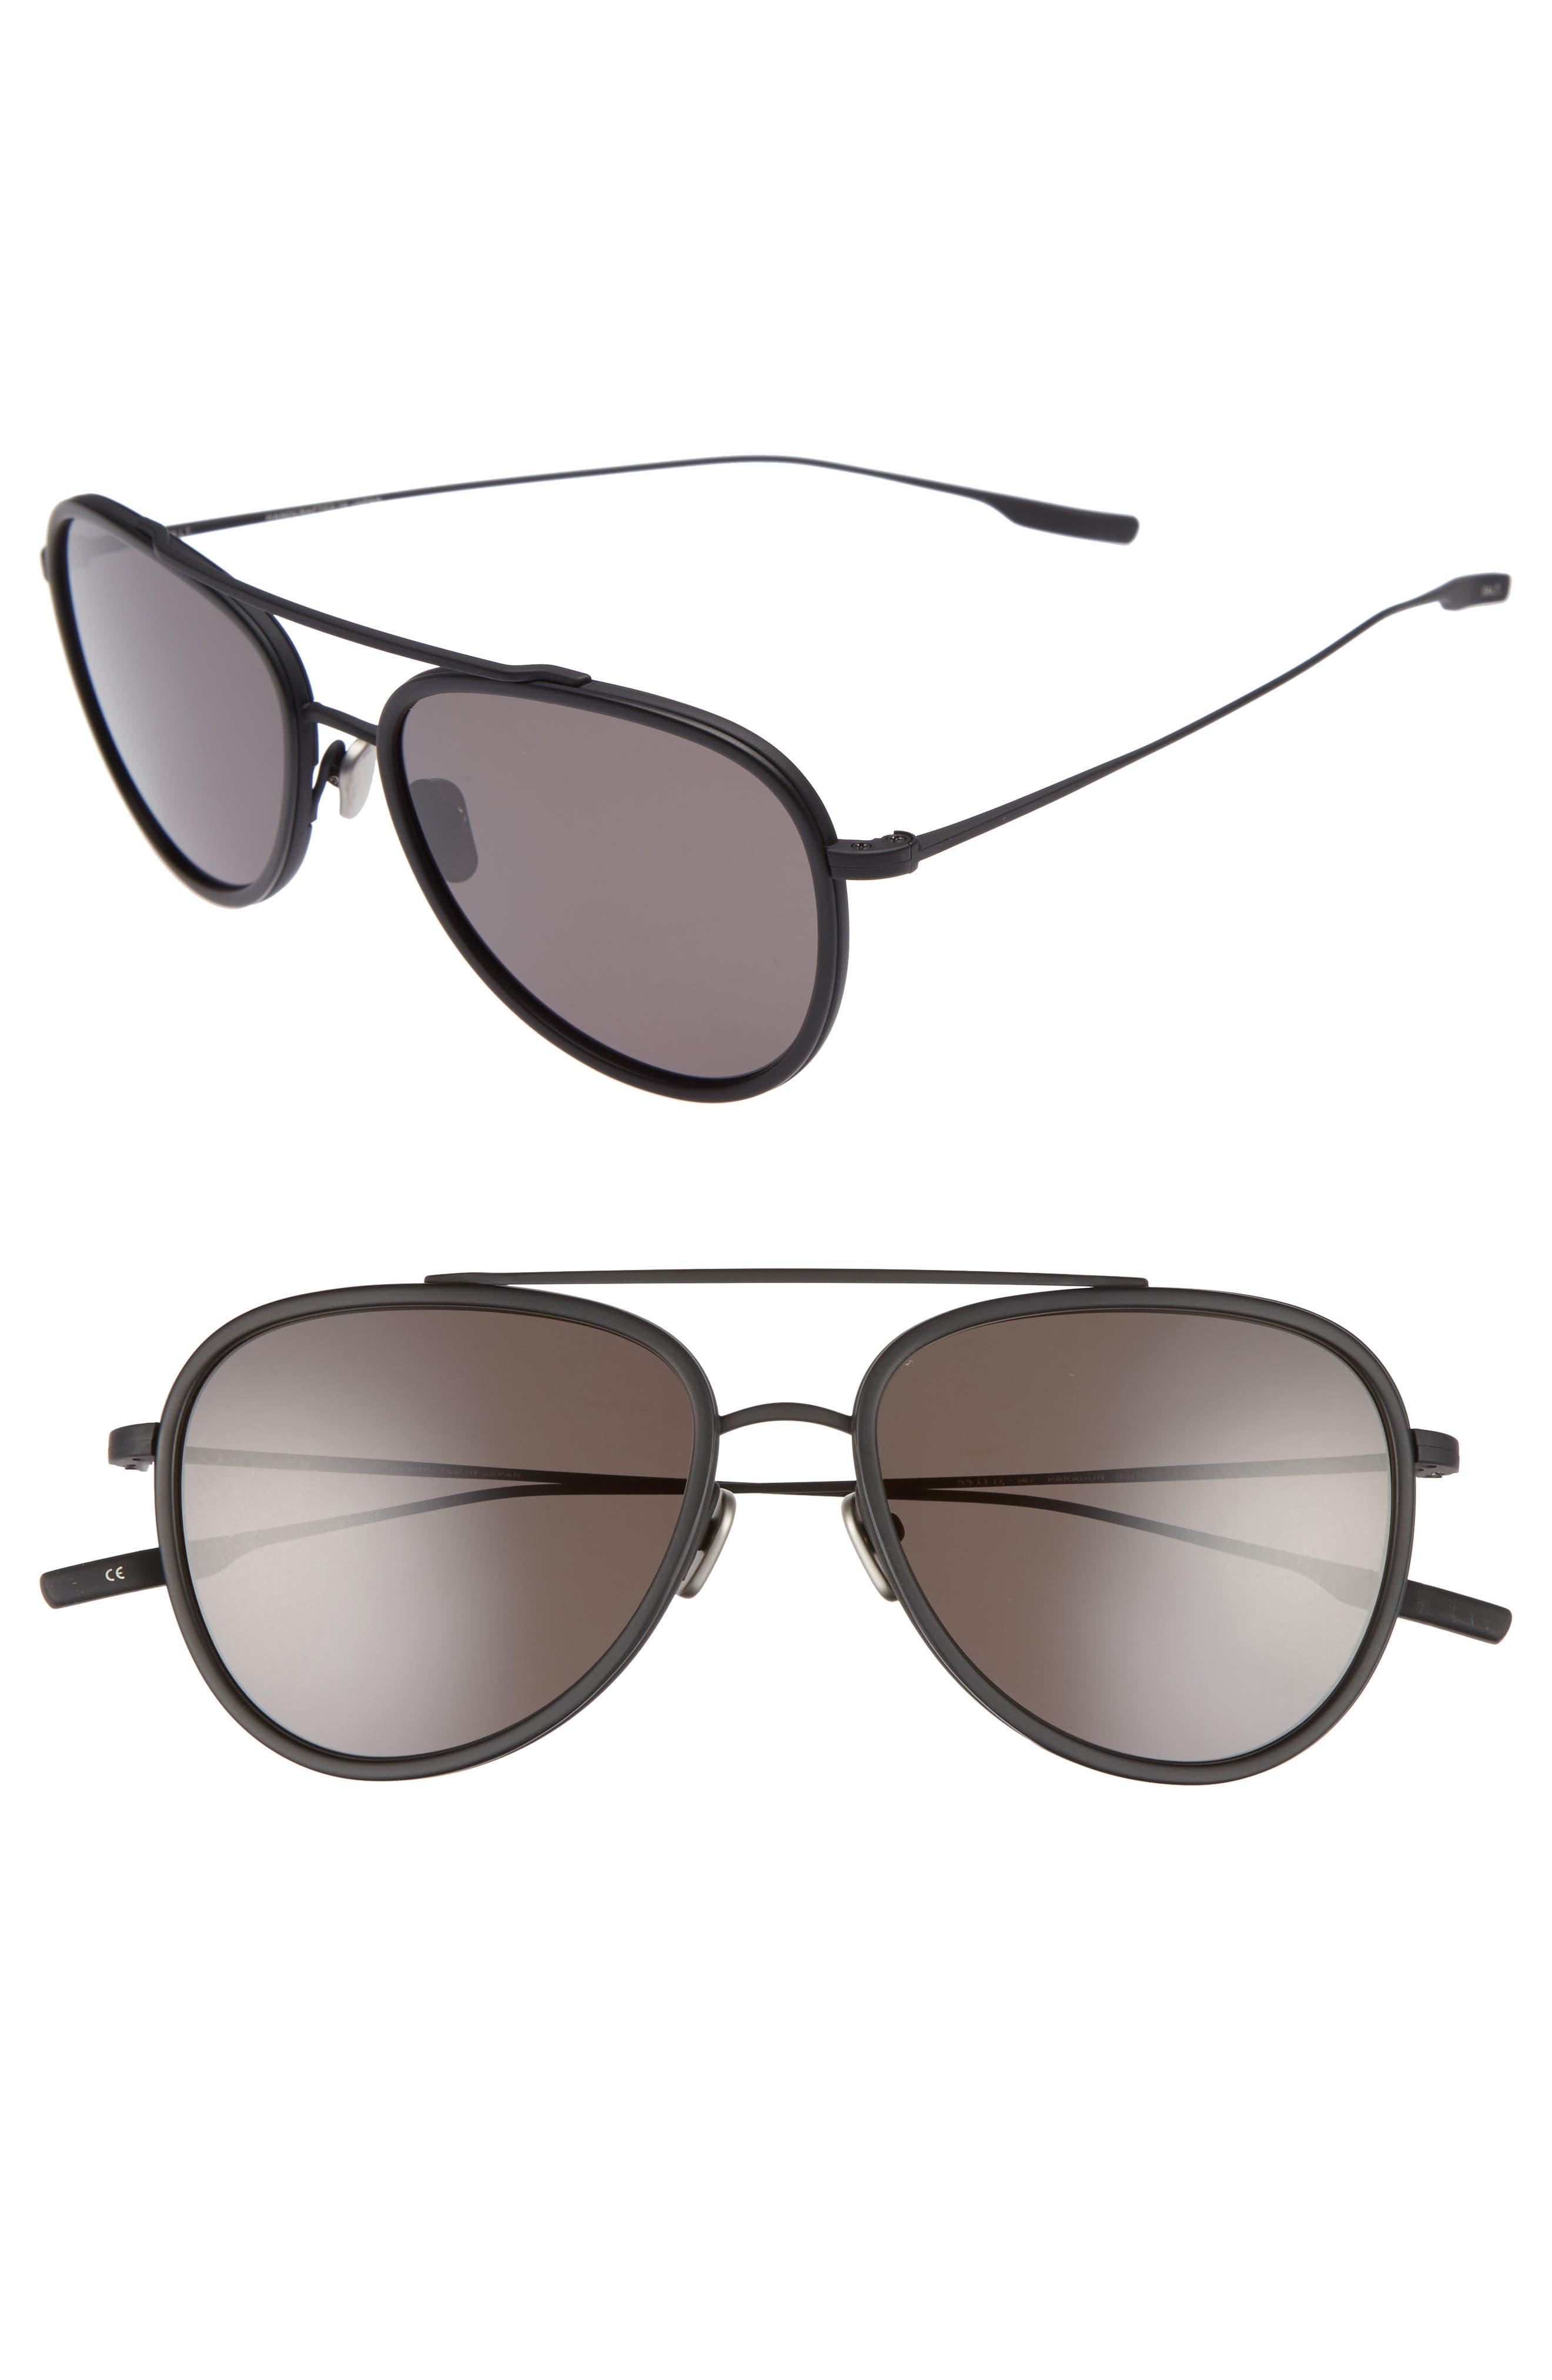 Main Image - SALT Paragon 55mm Polarized Aviator Sunglasses